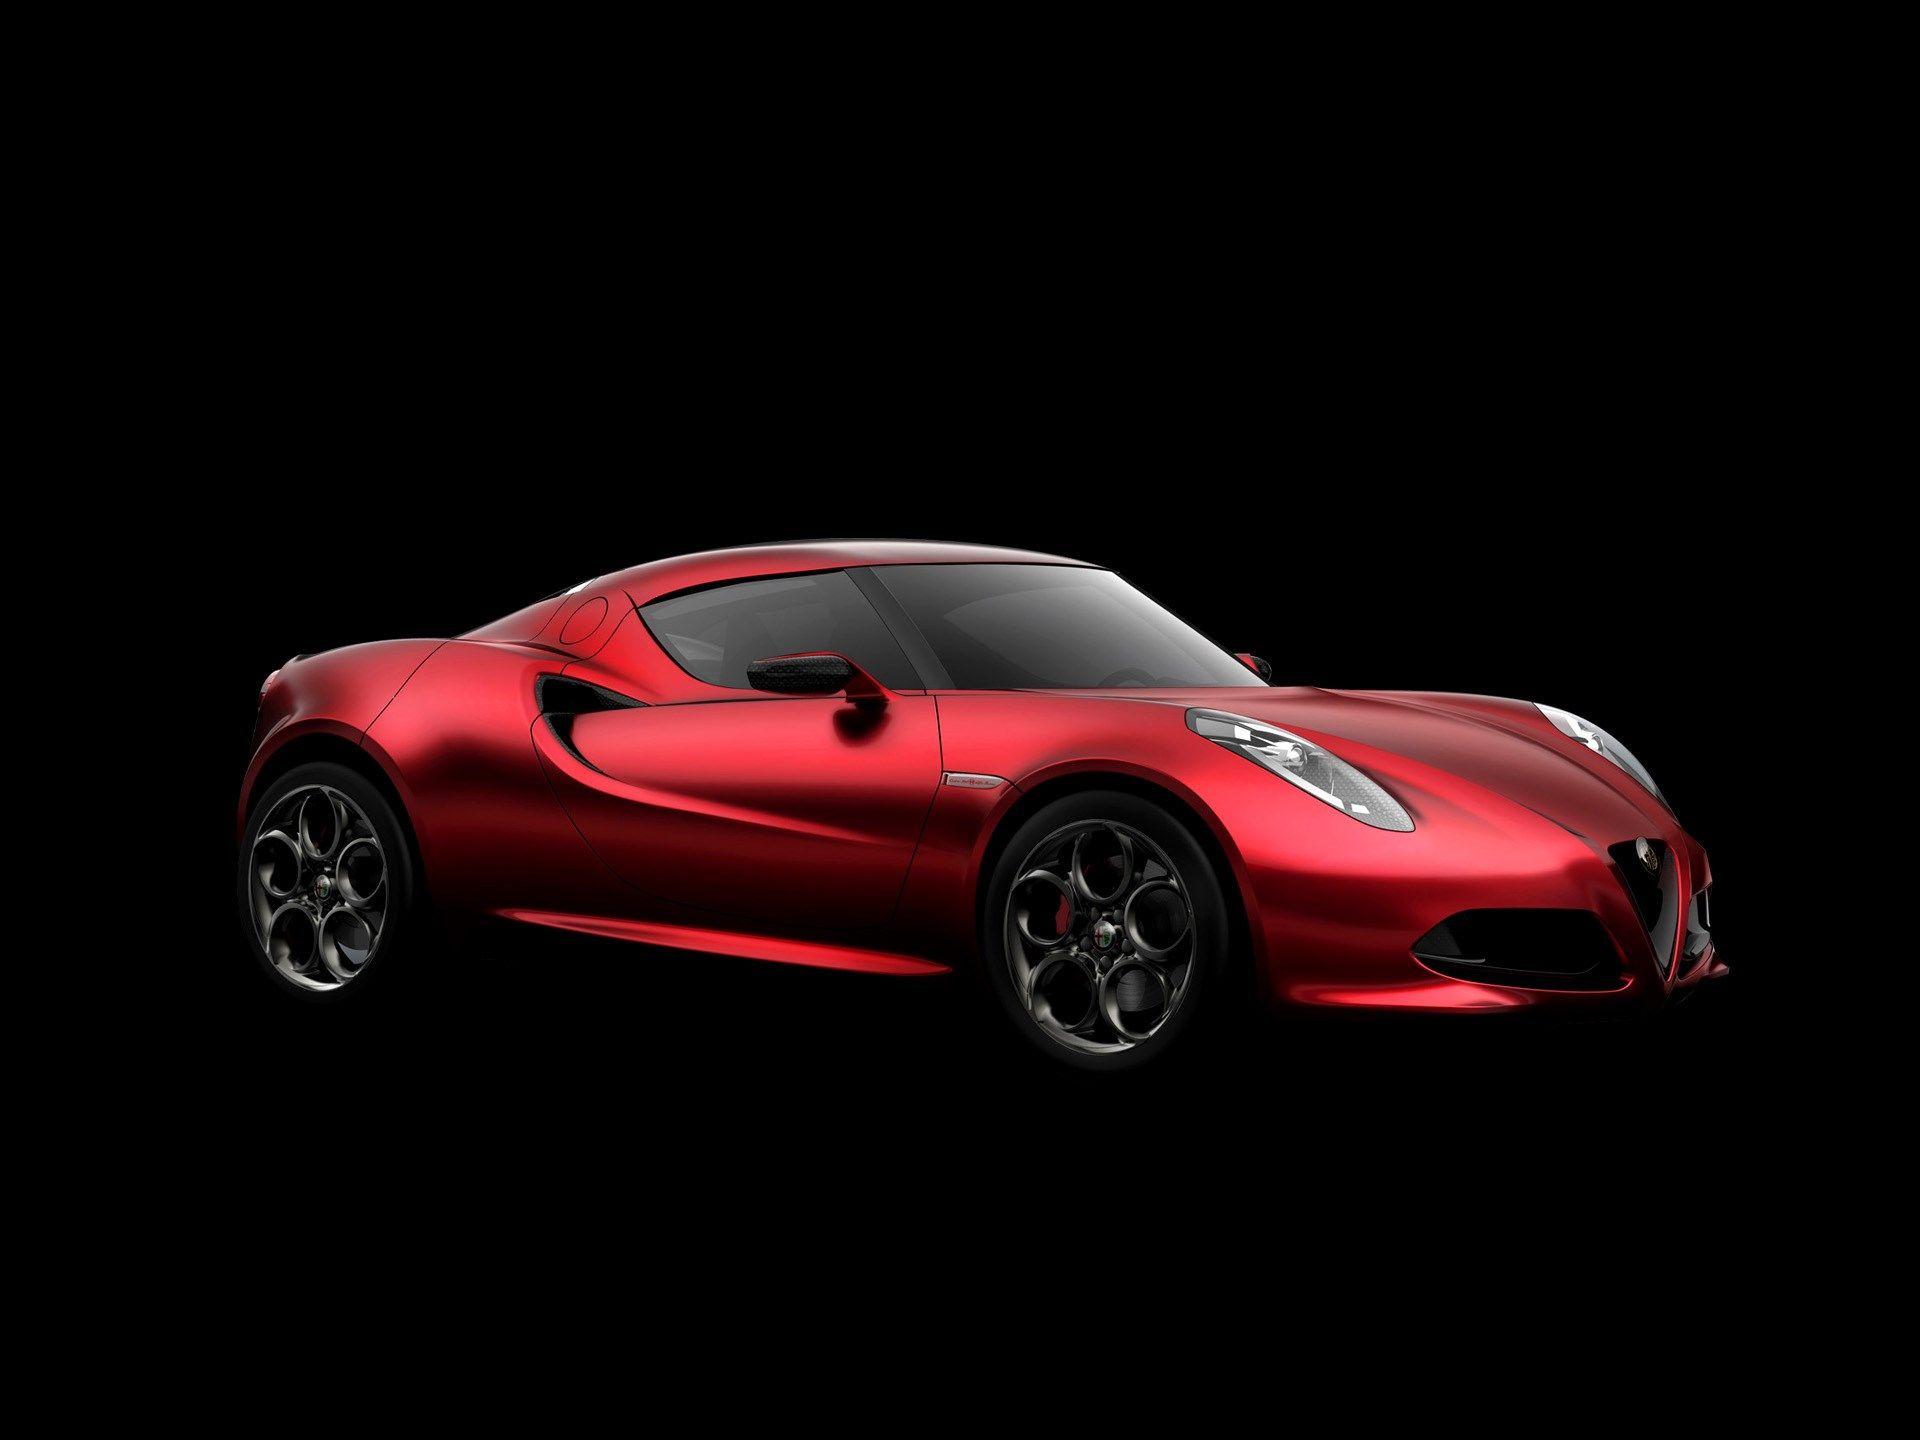 Alfa Romeo 4c Free For Desktop Alfa Romeo 4c Super Cars Alfa Romeo